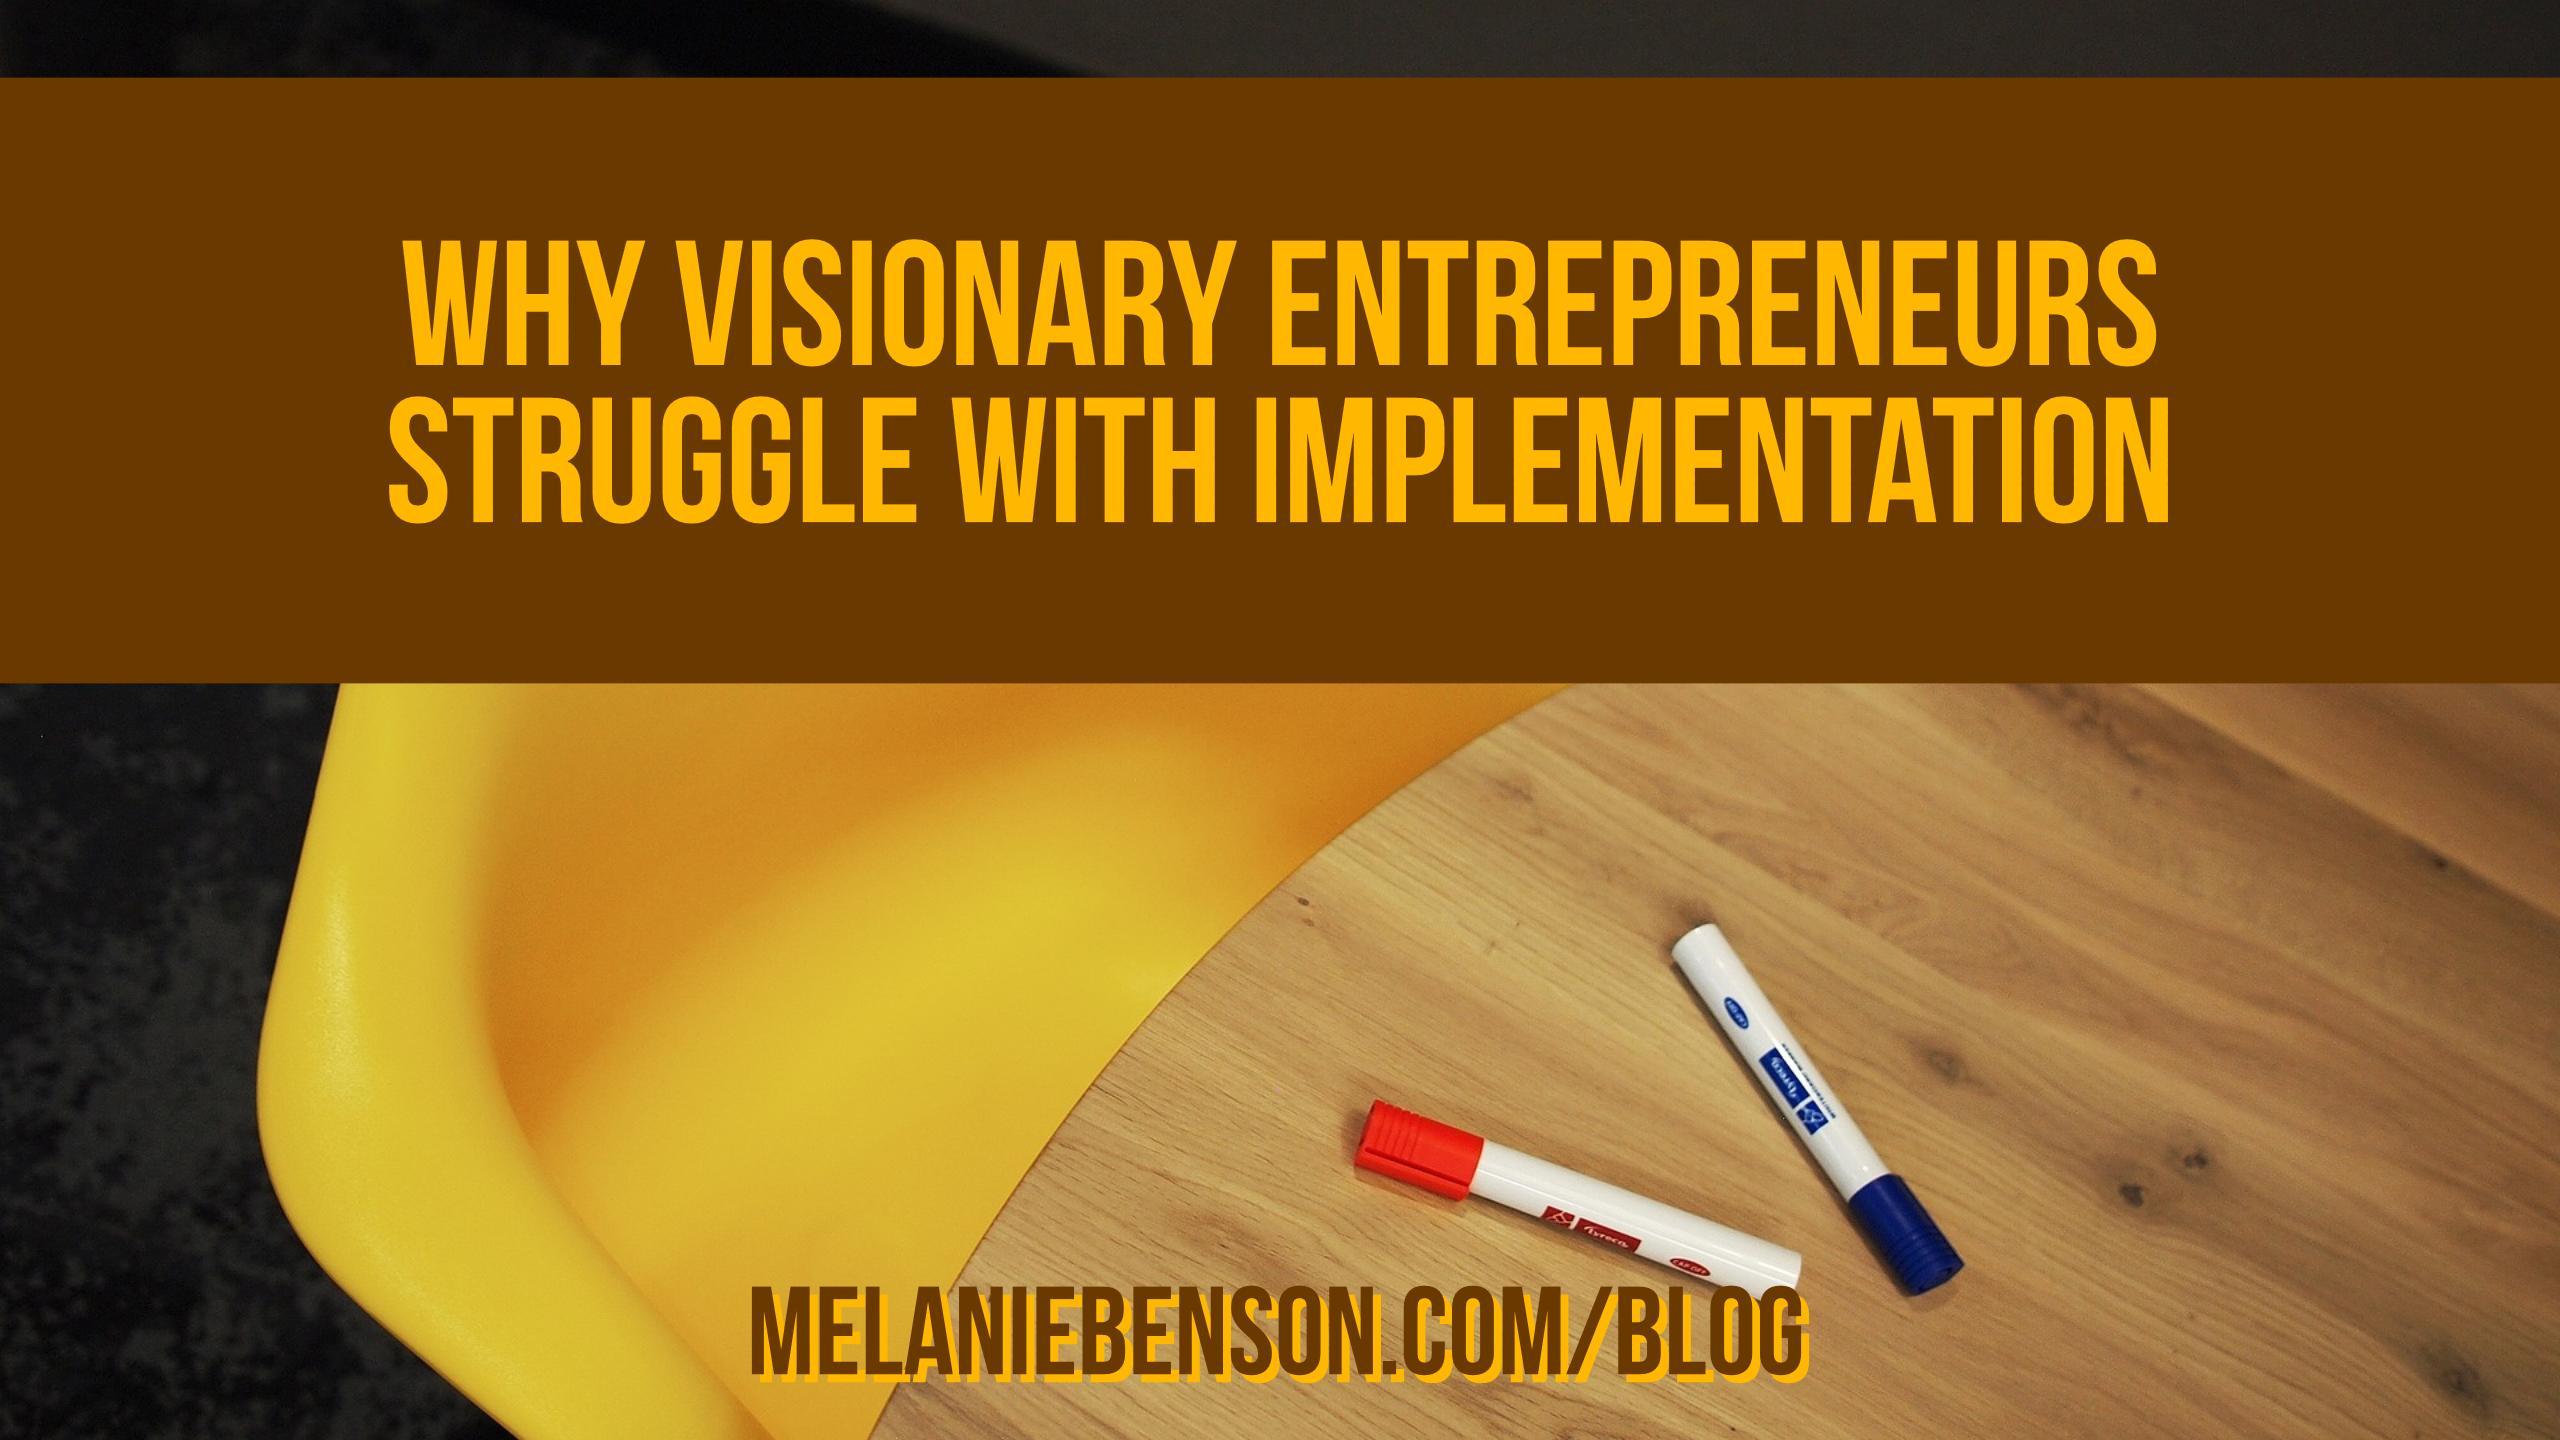 Visionary Entrepreneur Implementation